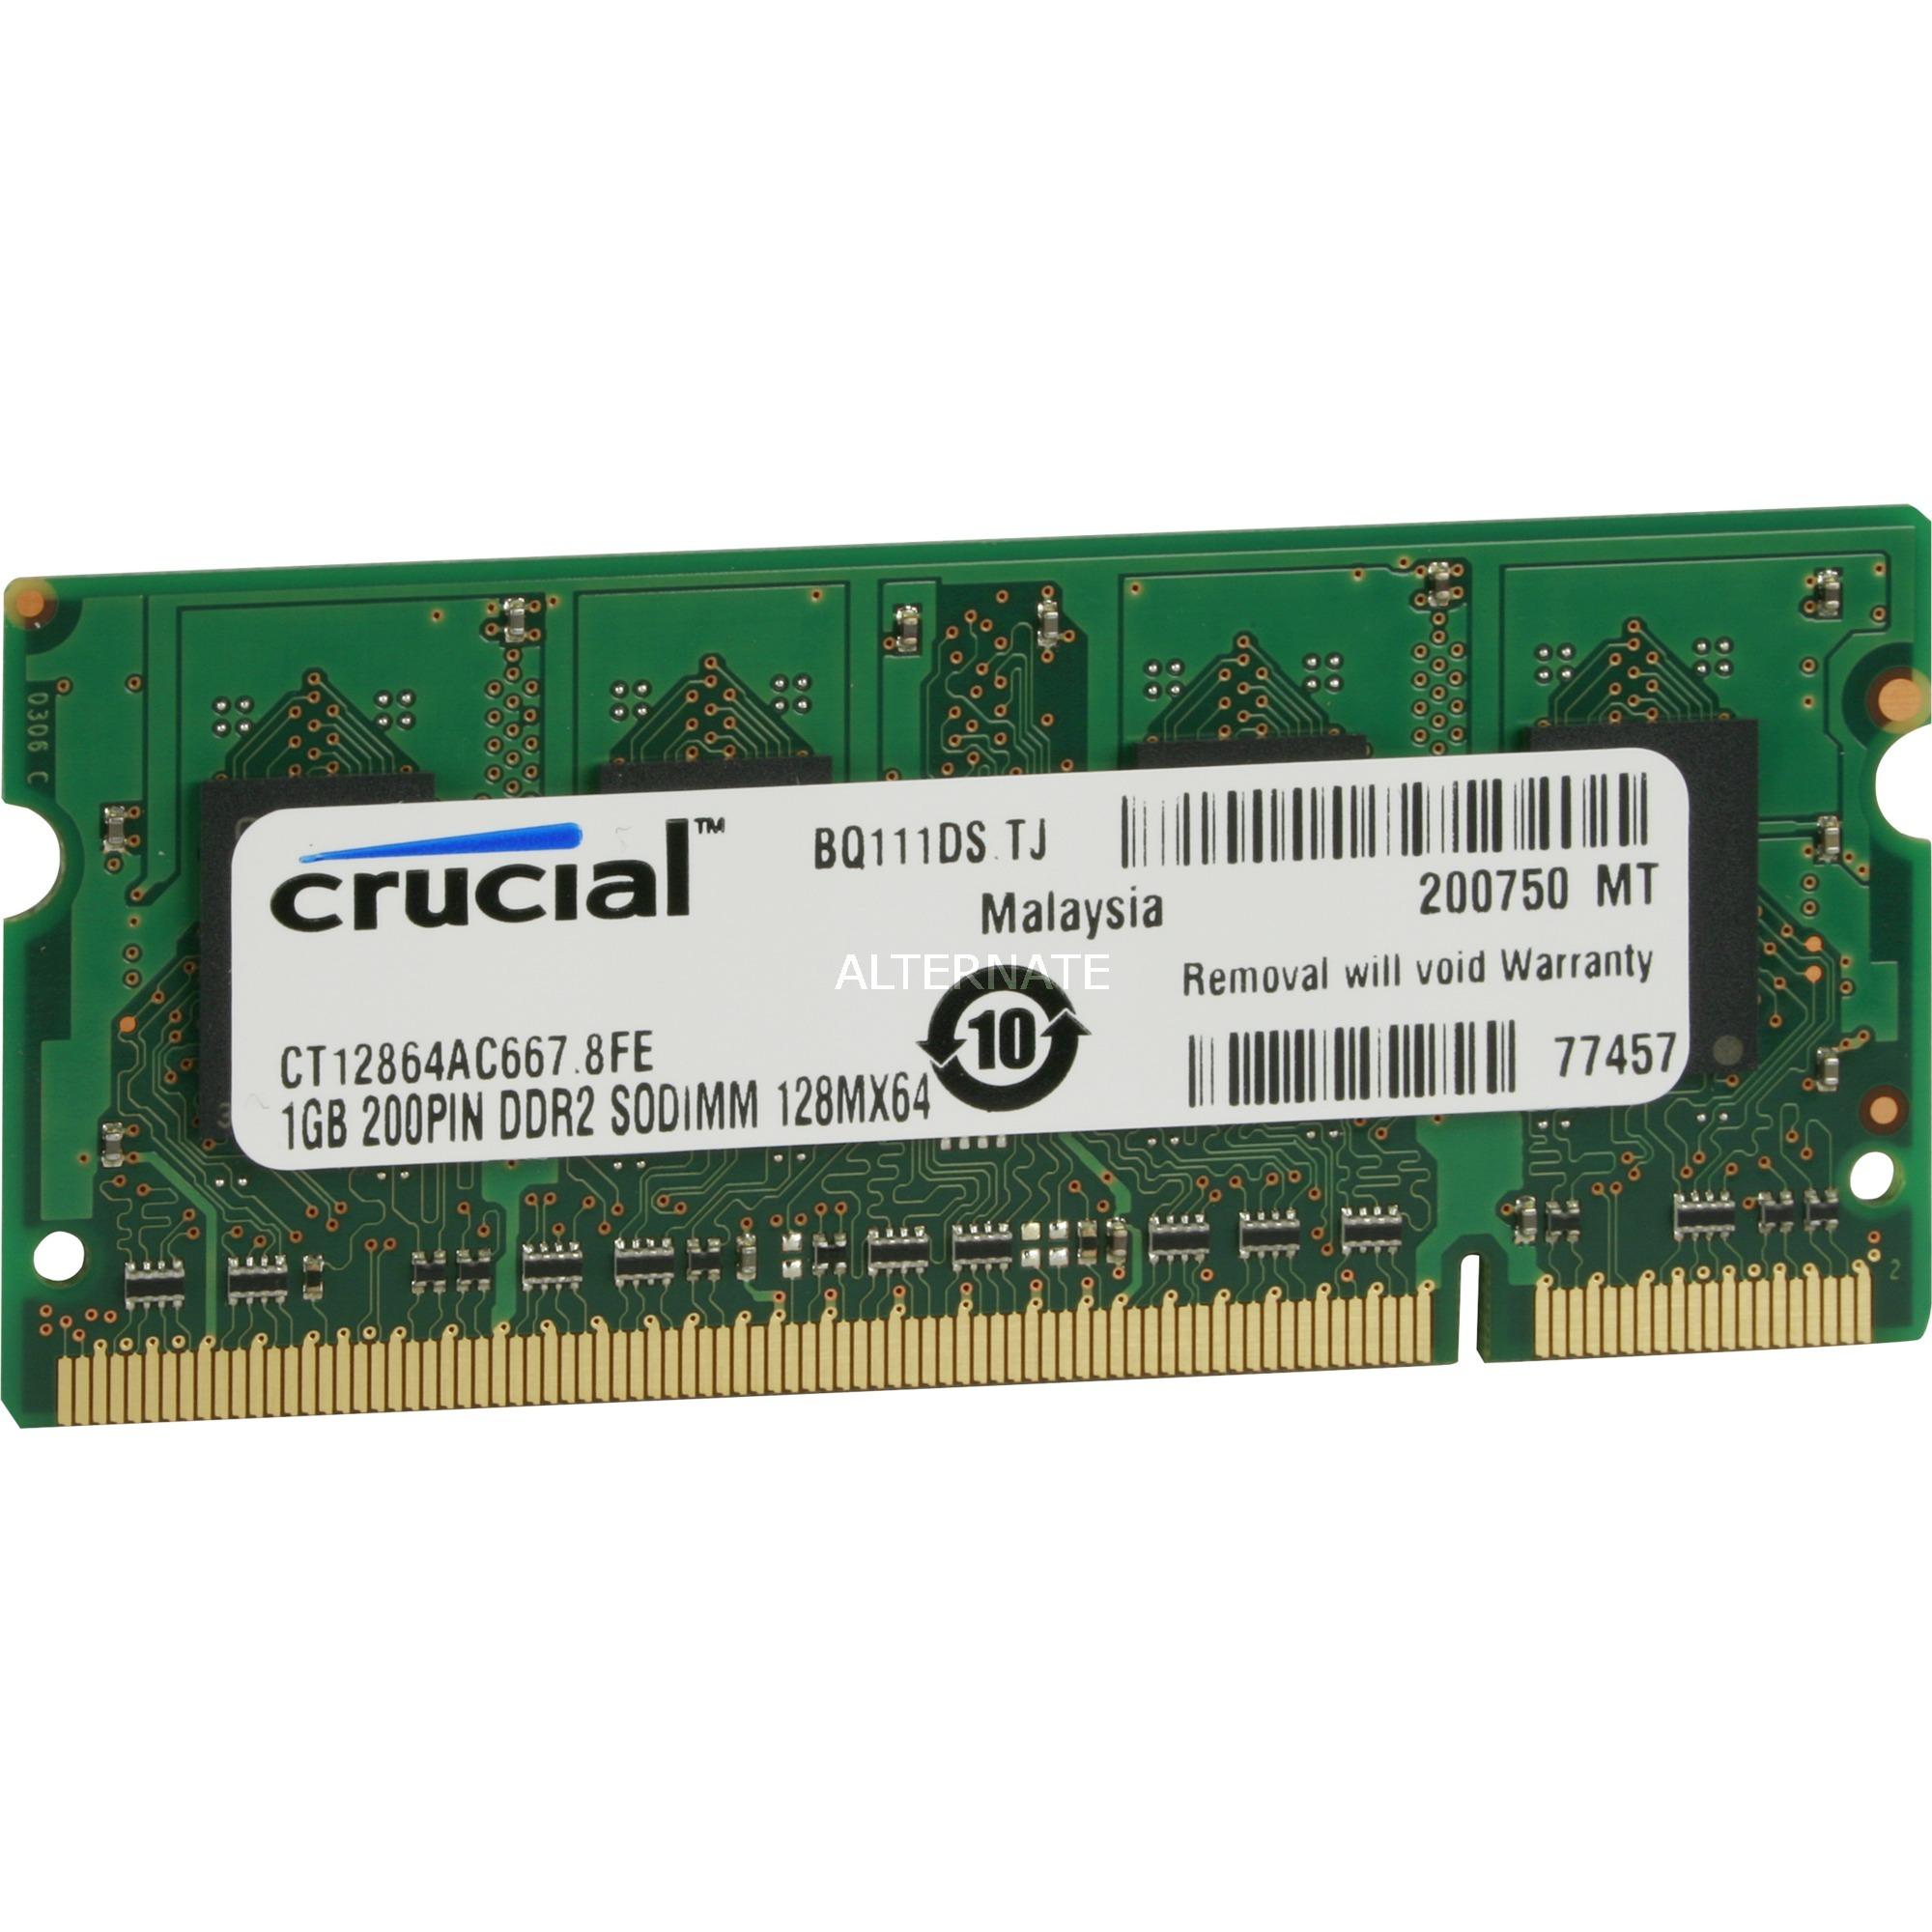 2GB DDR2 SODIMM 2GB DDR2 667MHz módulo de memoria, Memoria RAM